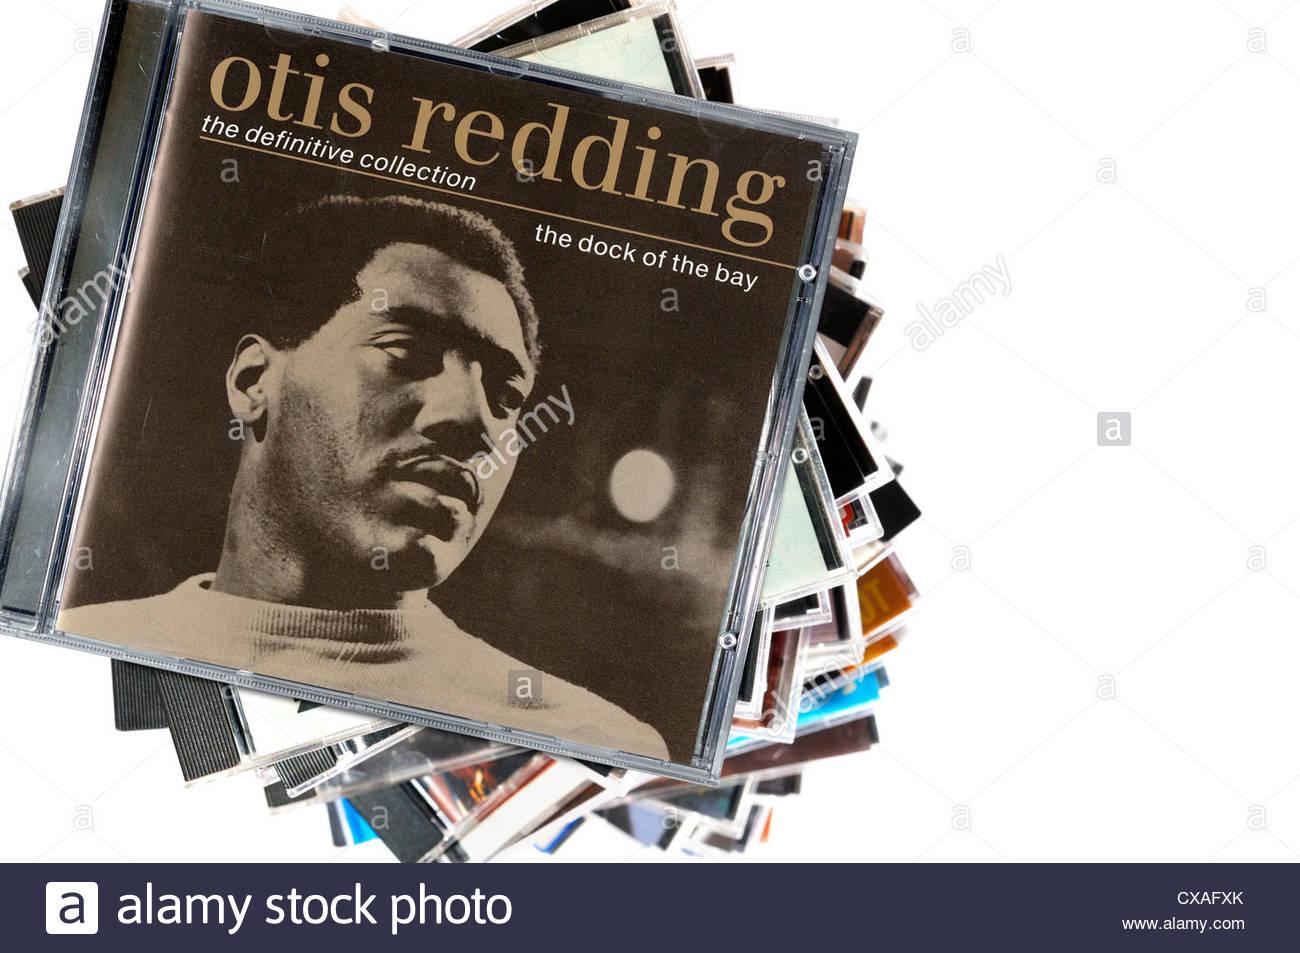 Otis Redding greatest hits Album the dock of the bay, CD cases, England - Stock Image